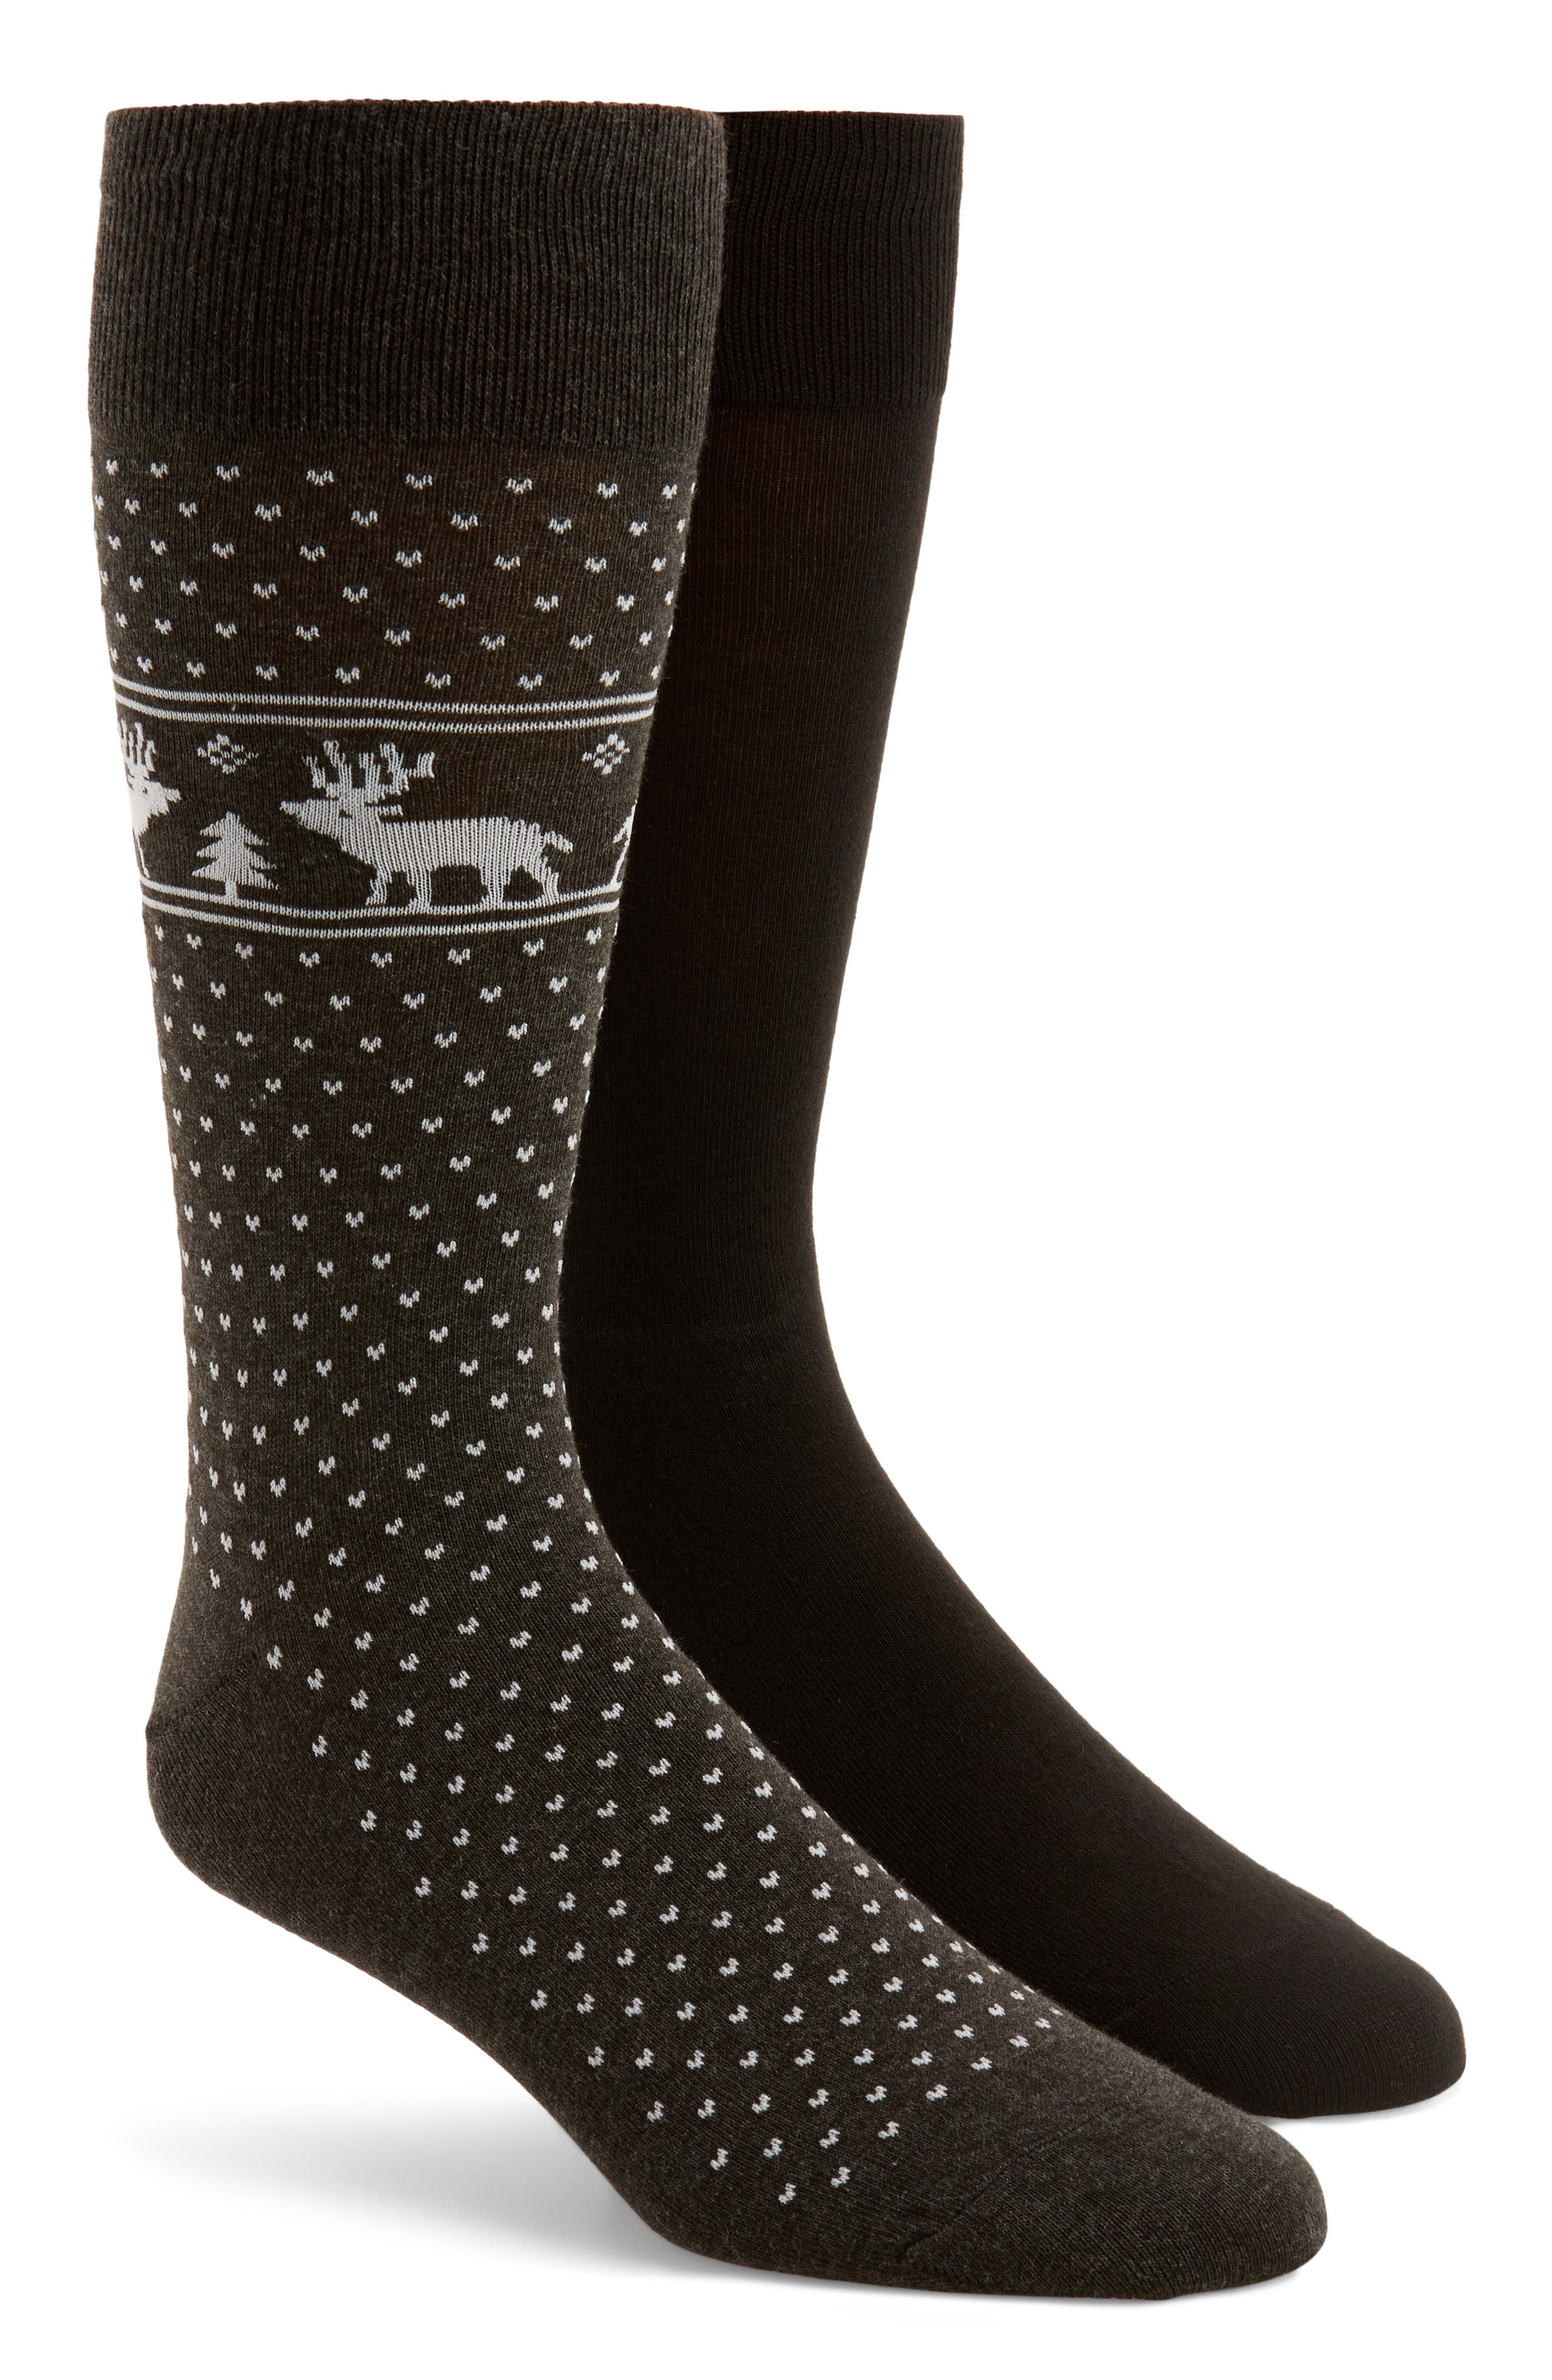 Polo Ralph Lauren 2-Pack Fair Isle Reindeer Socks